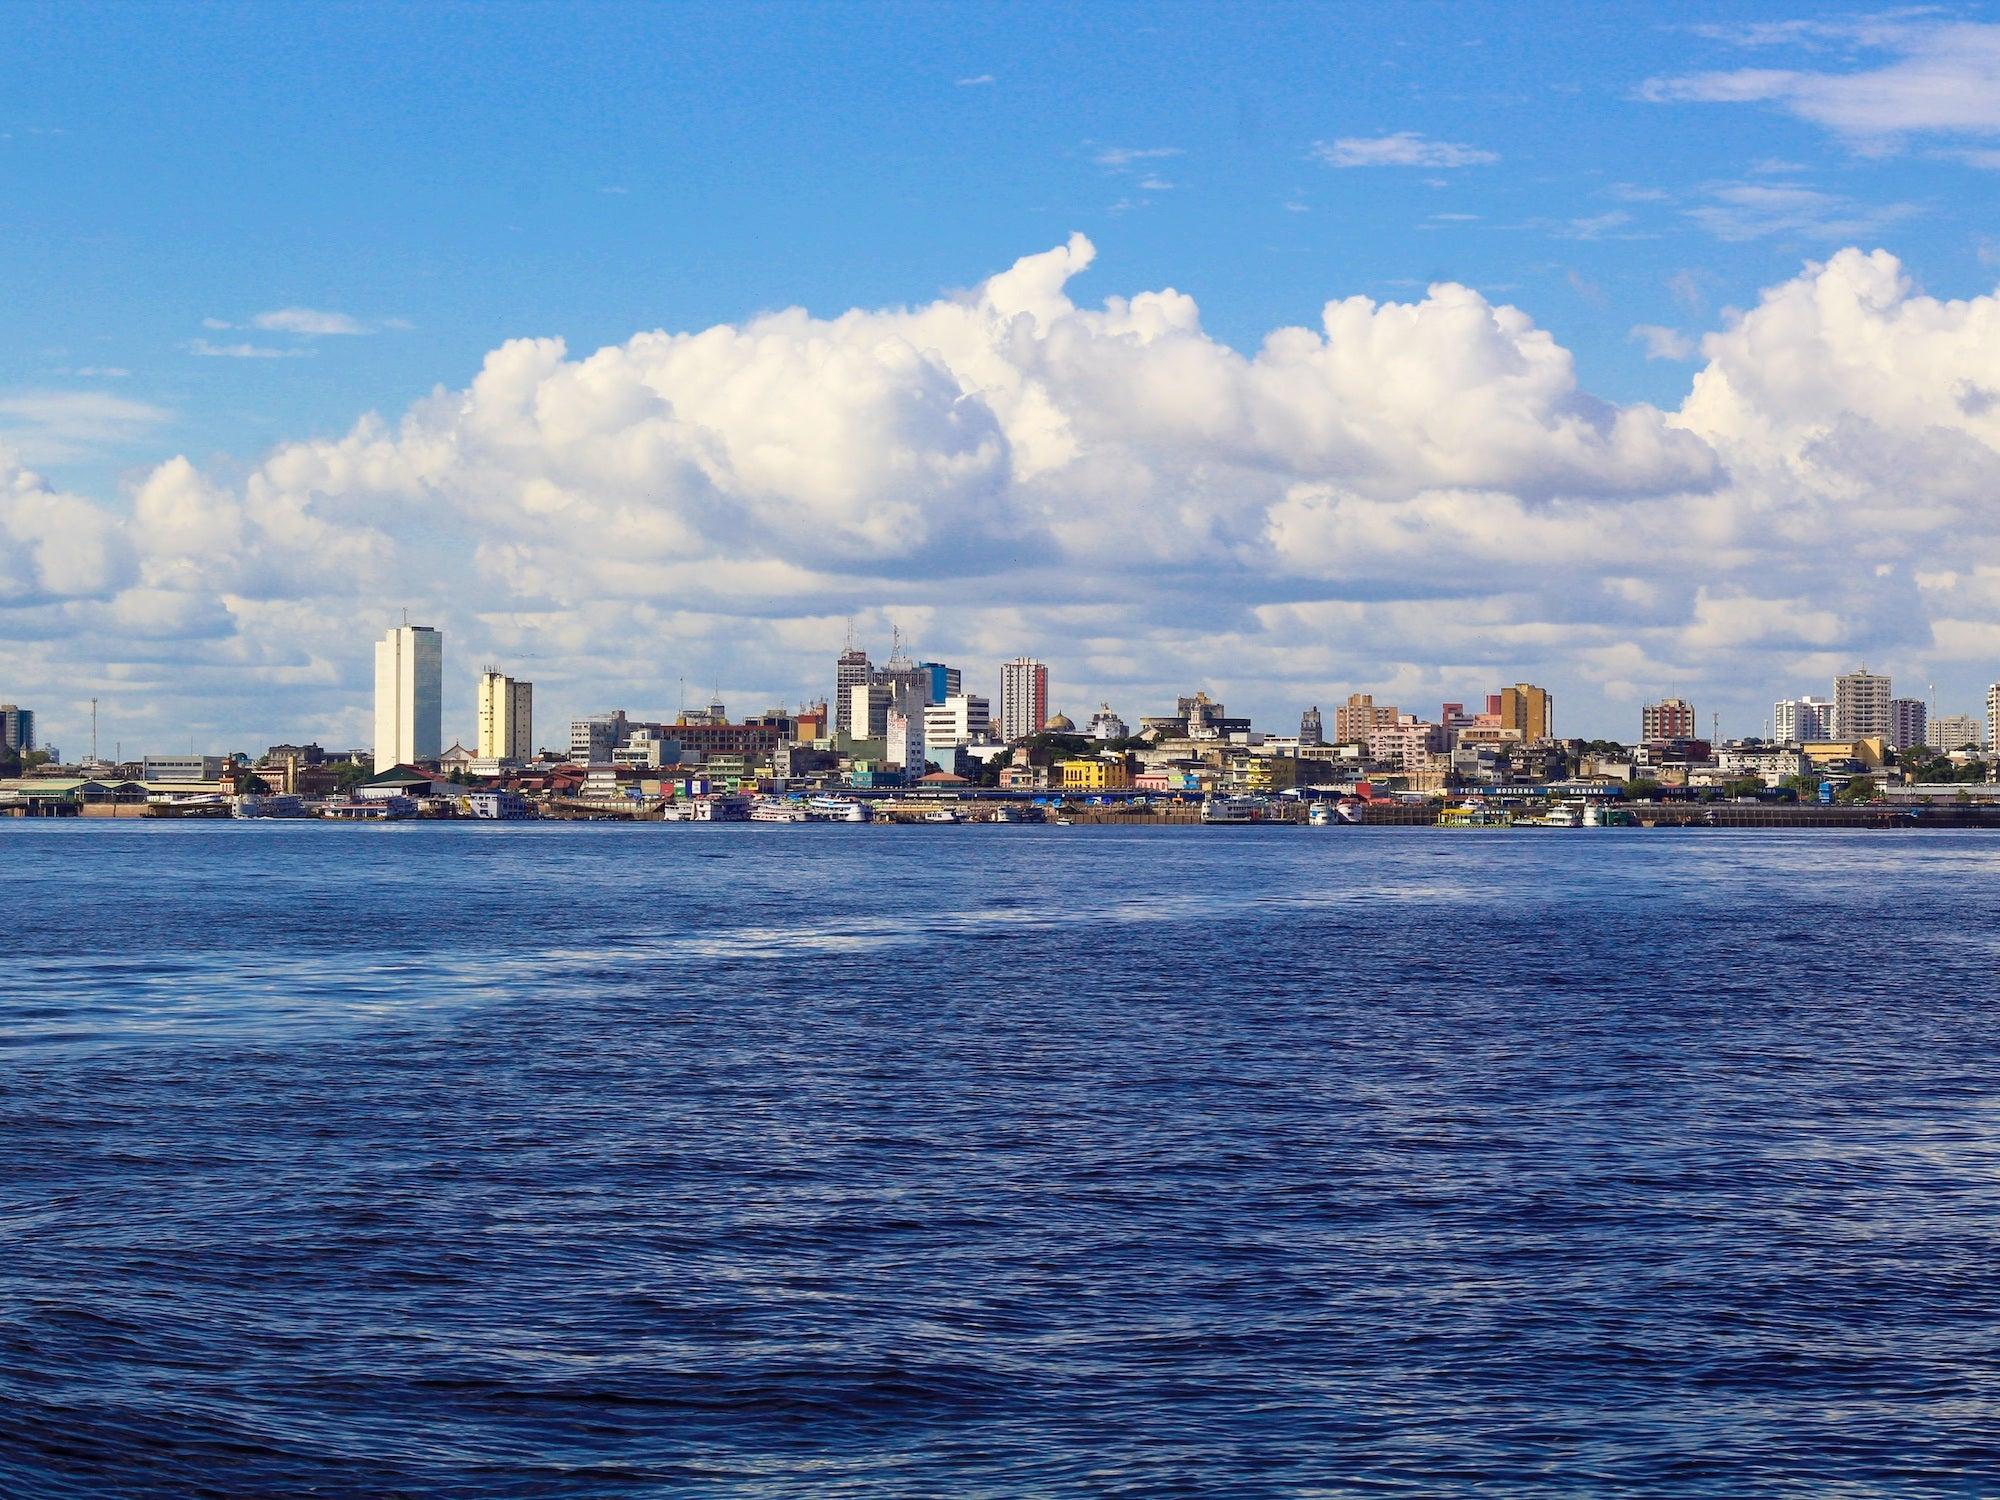 manaus city in amazon